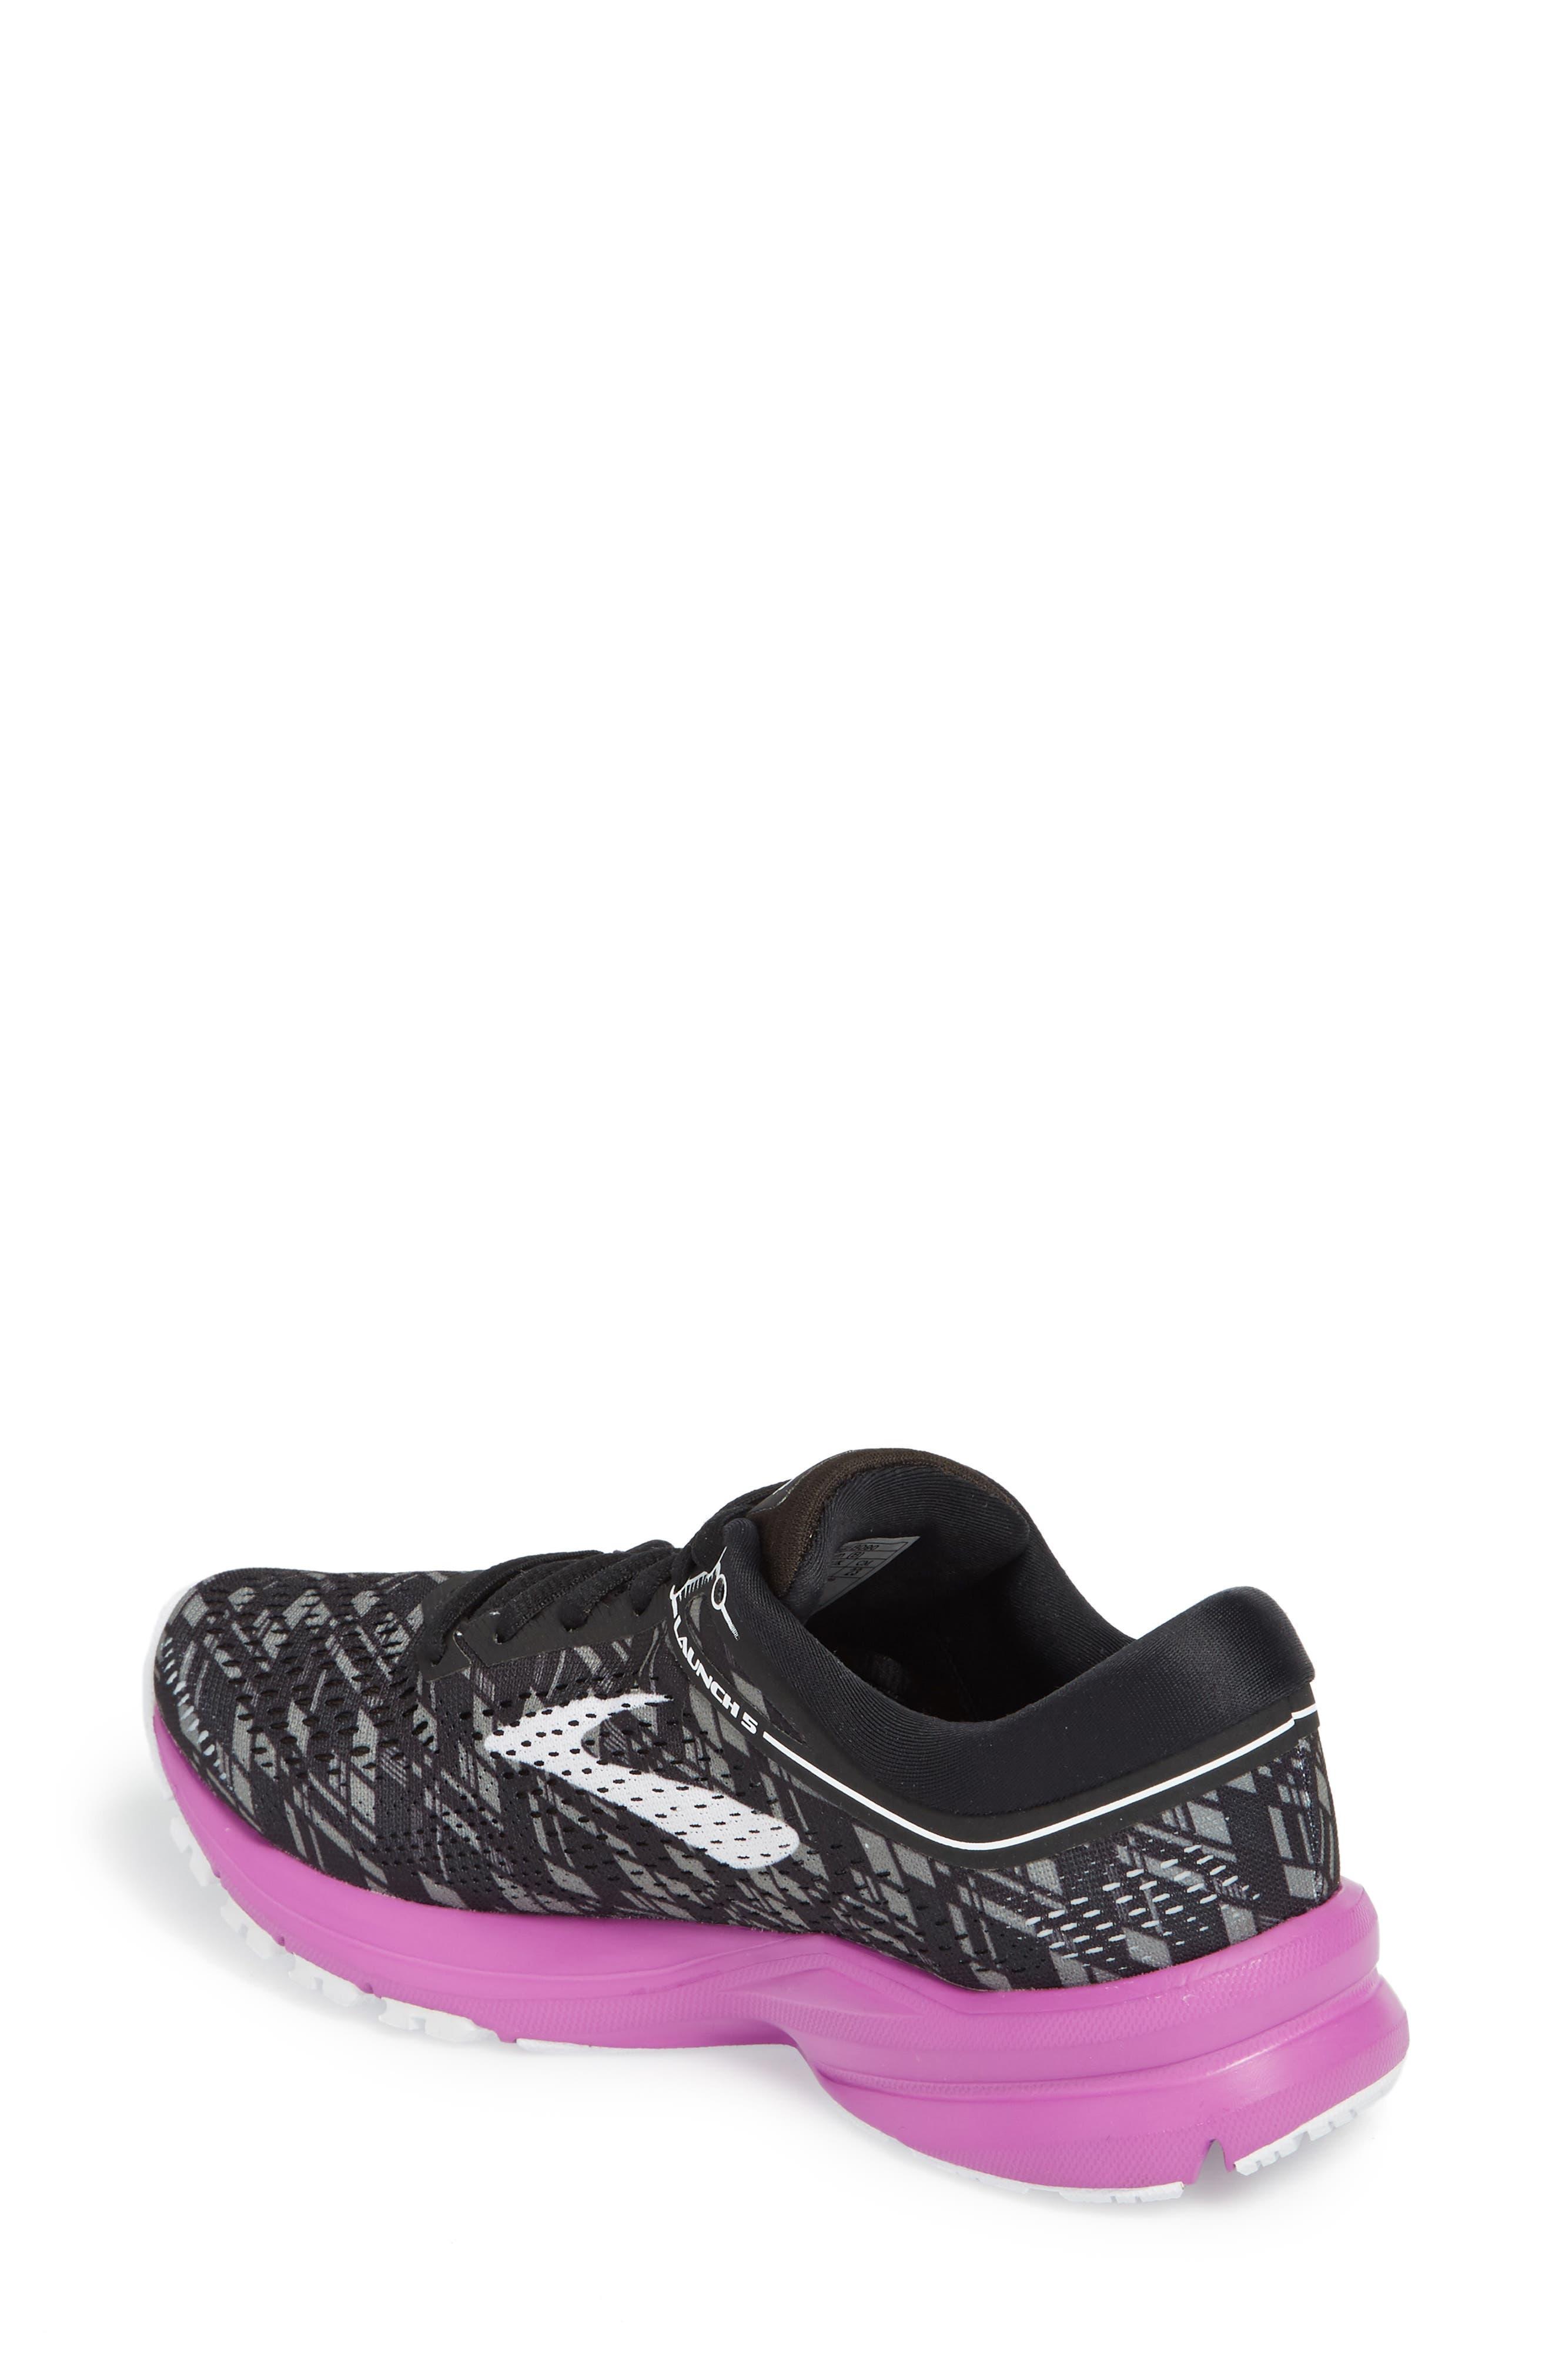 Launch 5 Running Shoe,                             Alternate thumbnail 2, color,                             BLACK/ PURPLE/ PRINT